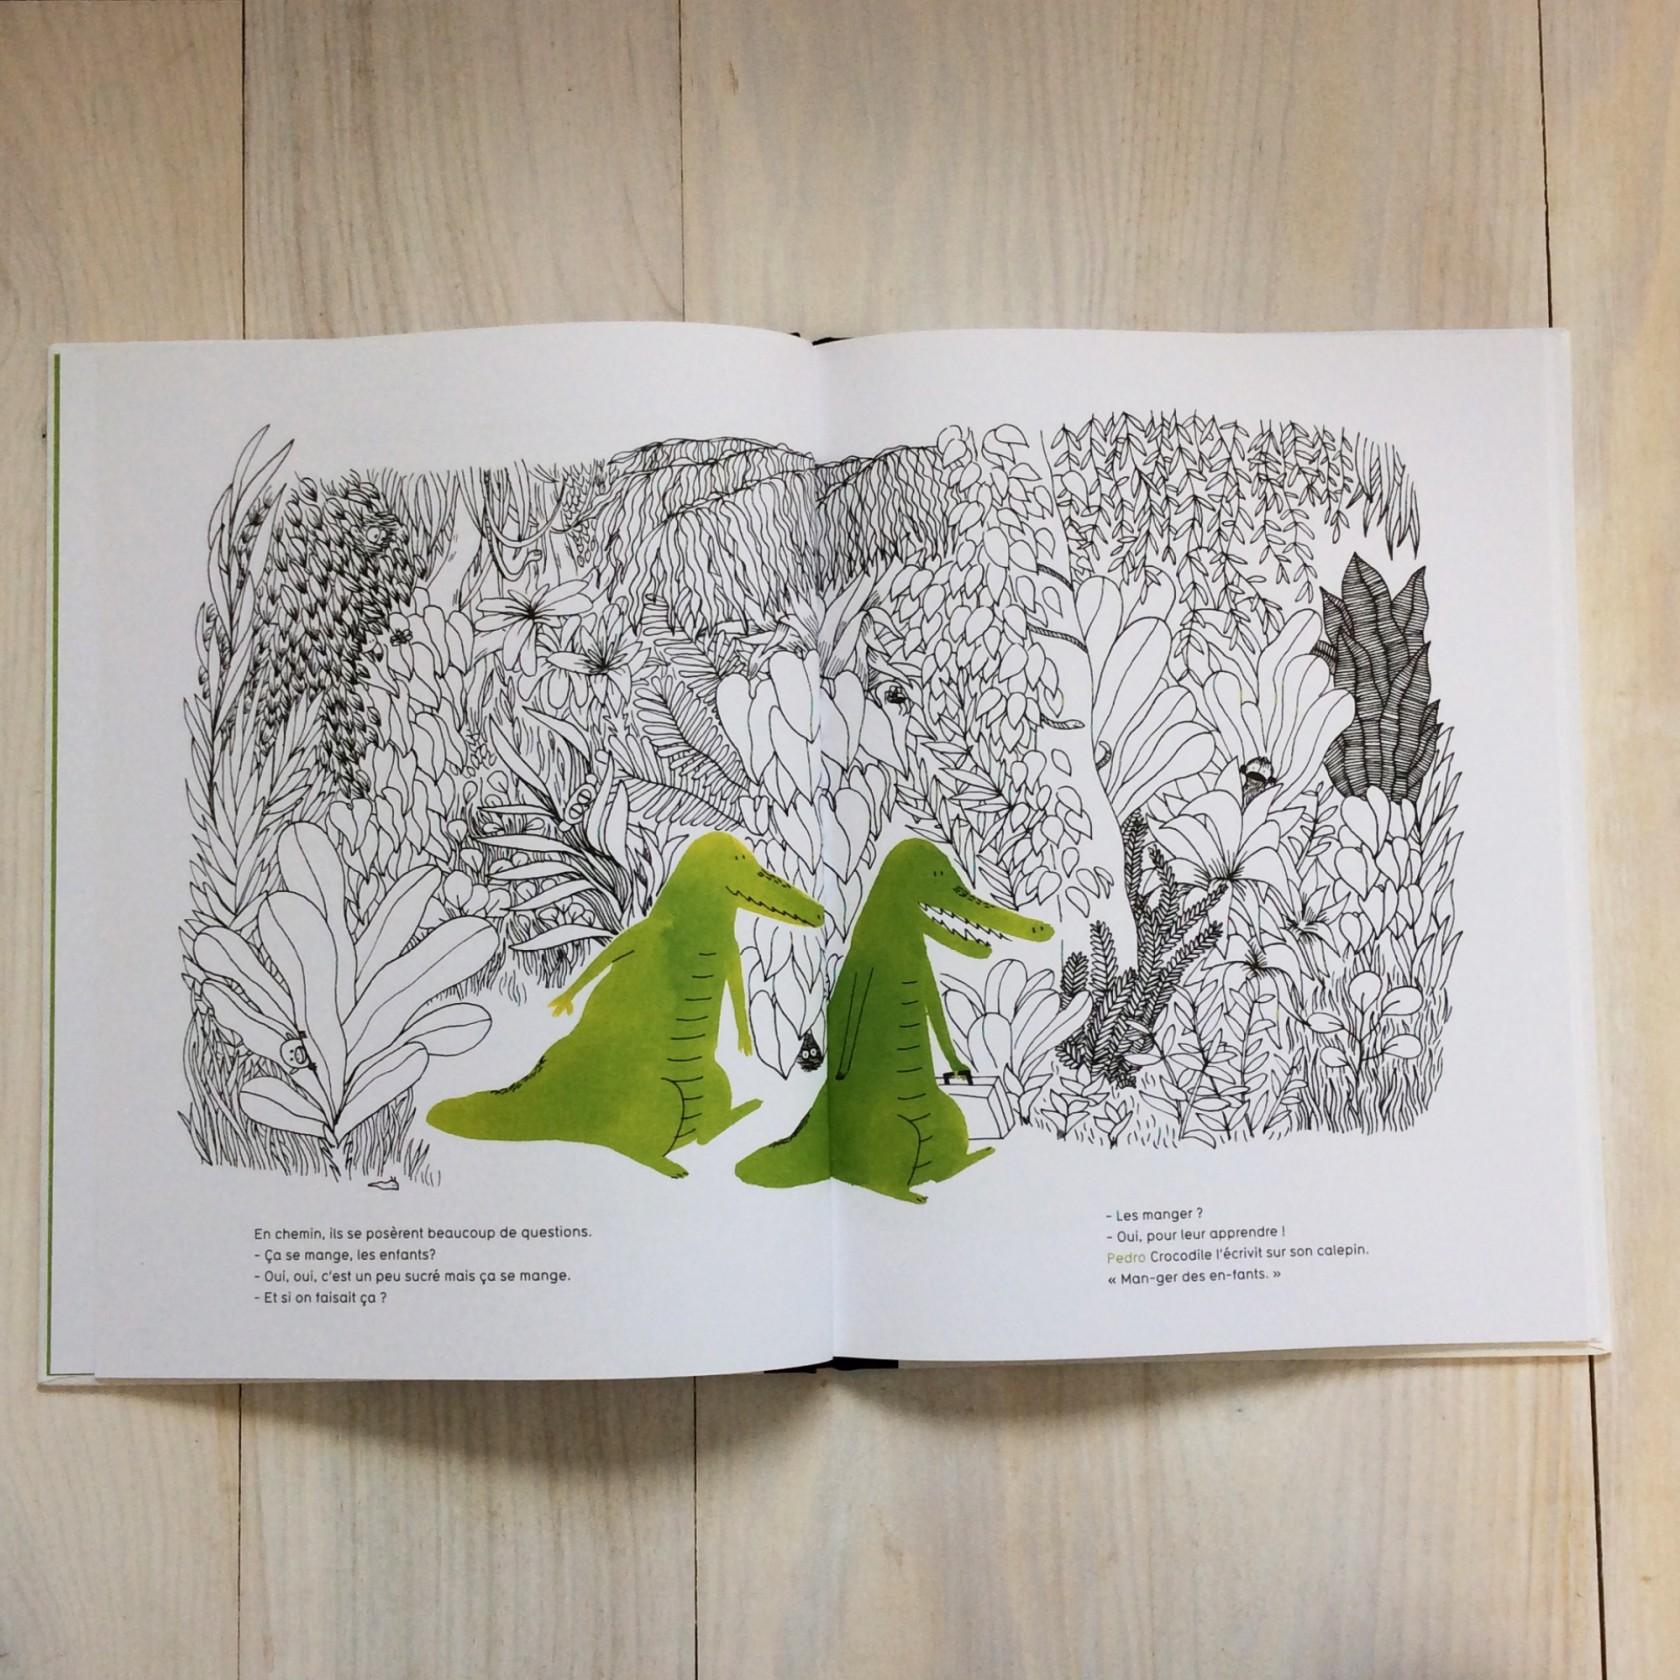 fouinzanardi -  fz_print.books_lesfourmsirouges517